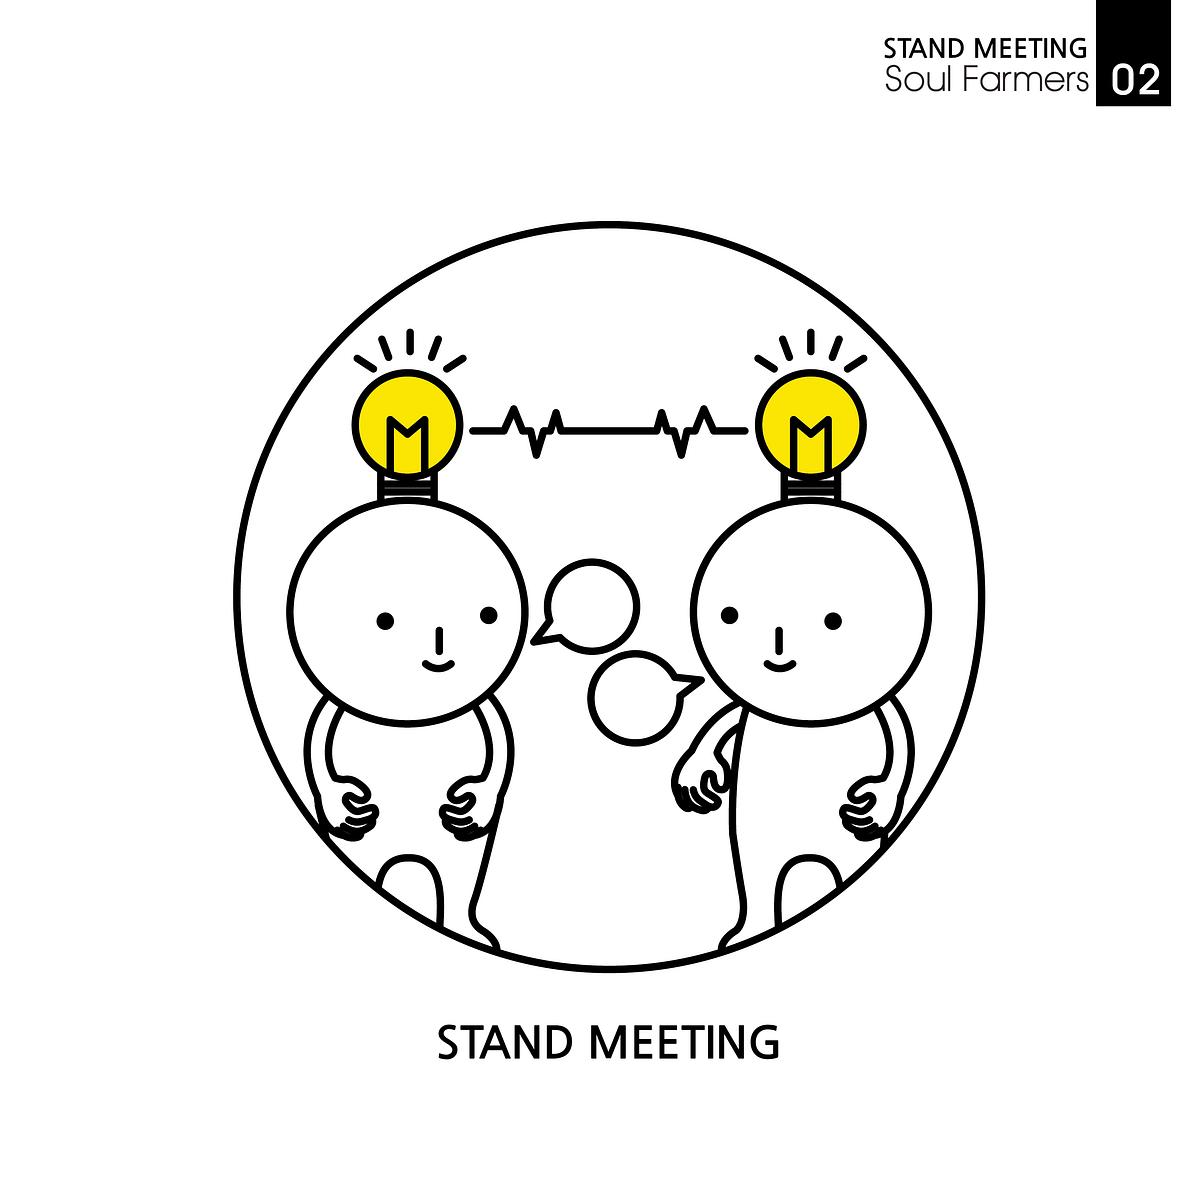 [Team communication] STAND MEETING / 스탠드 미팅